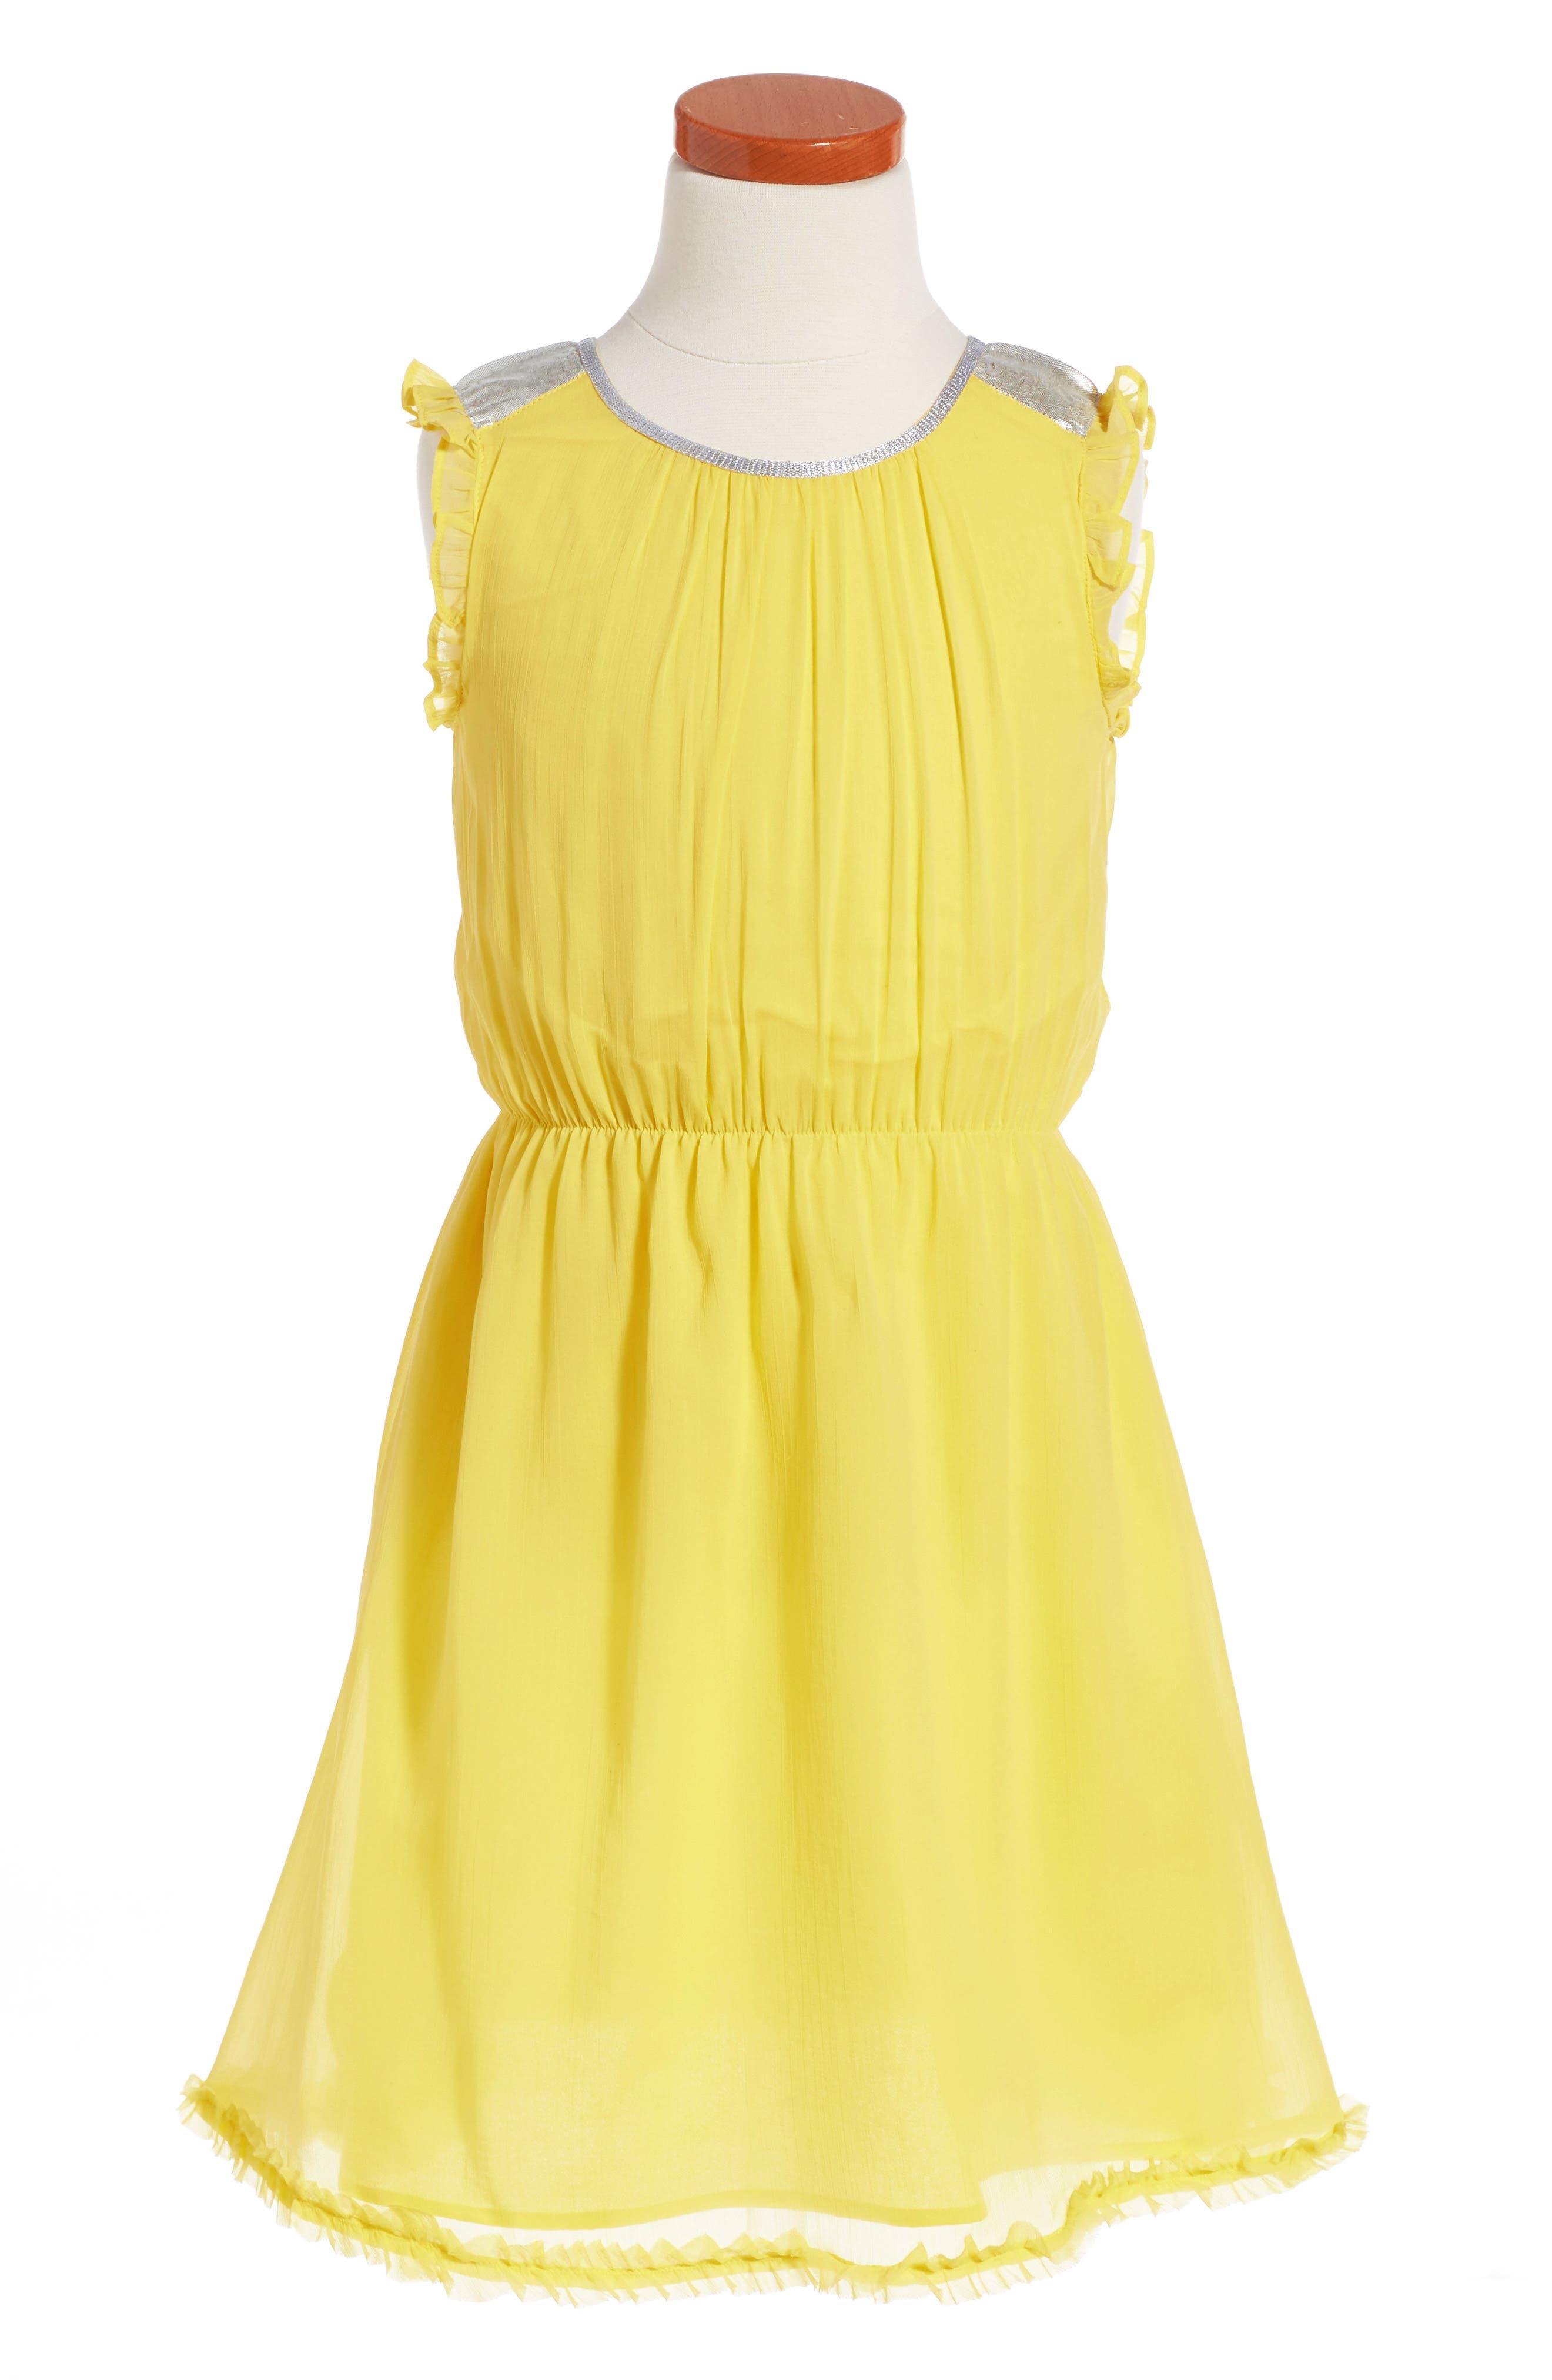 WILD & GORGEOUS June July Dress